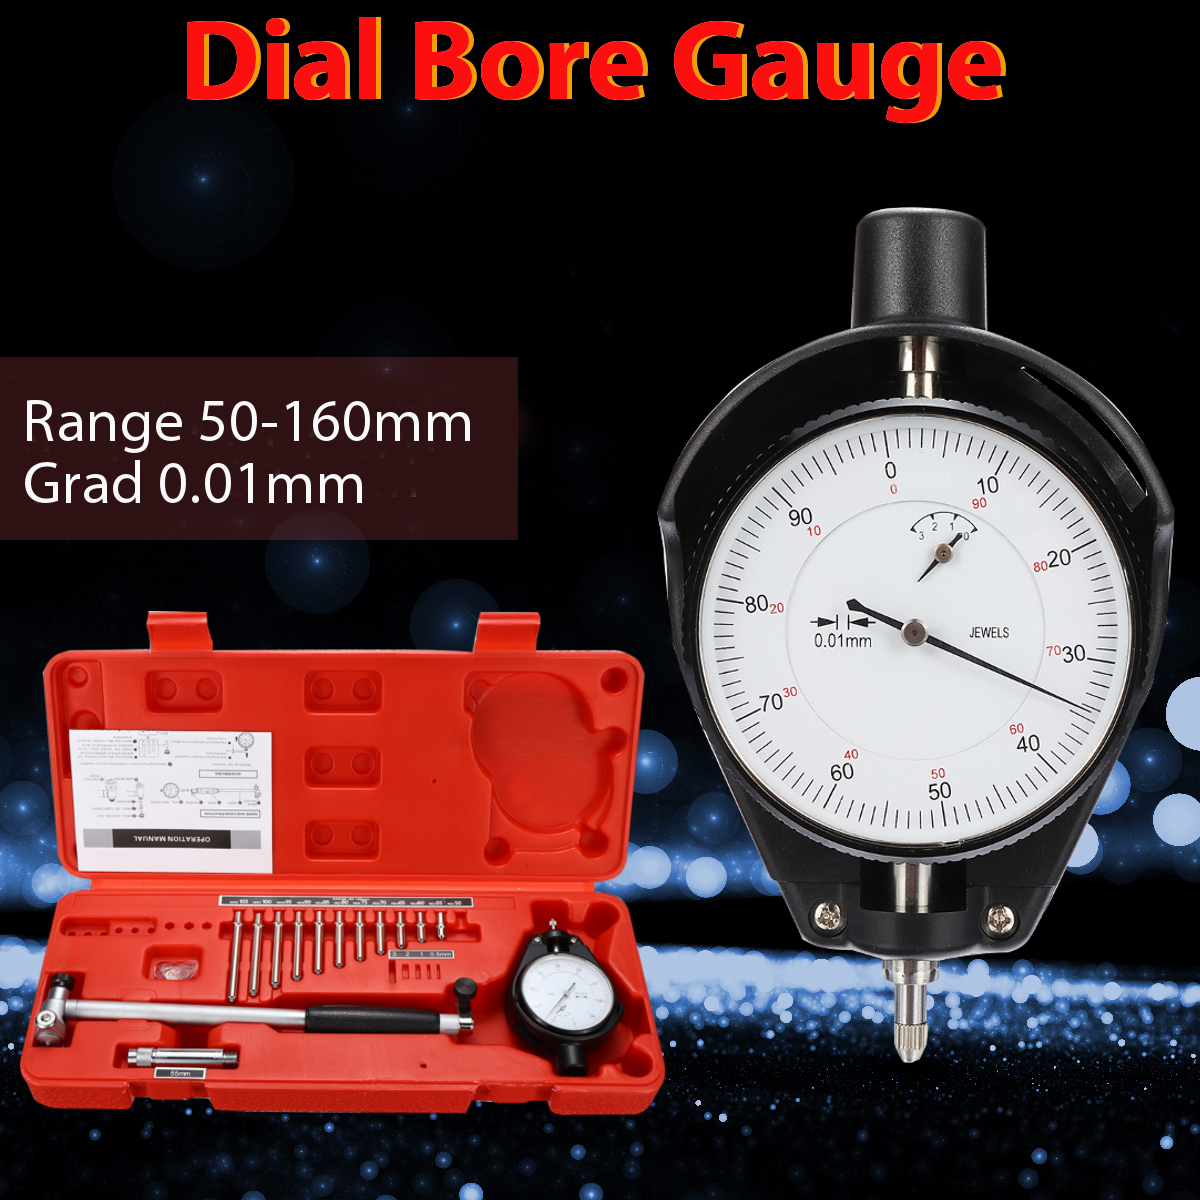 цена на 50-160mm/0.018mm Dial Measuring Indicator Inner Diameter Center Ring Dial Bore Gauge Steel+ABS Durability Movable/Change Probe